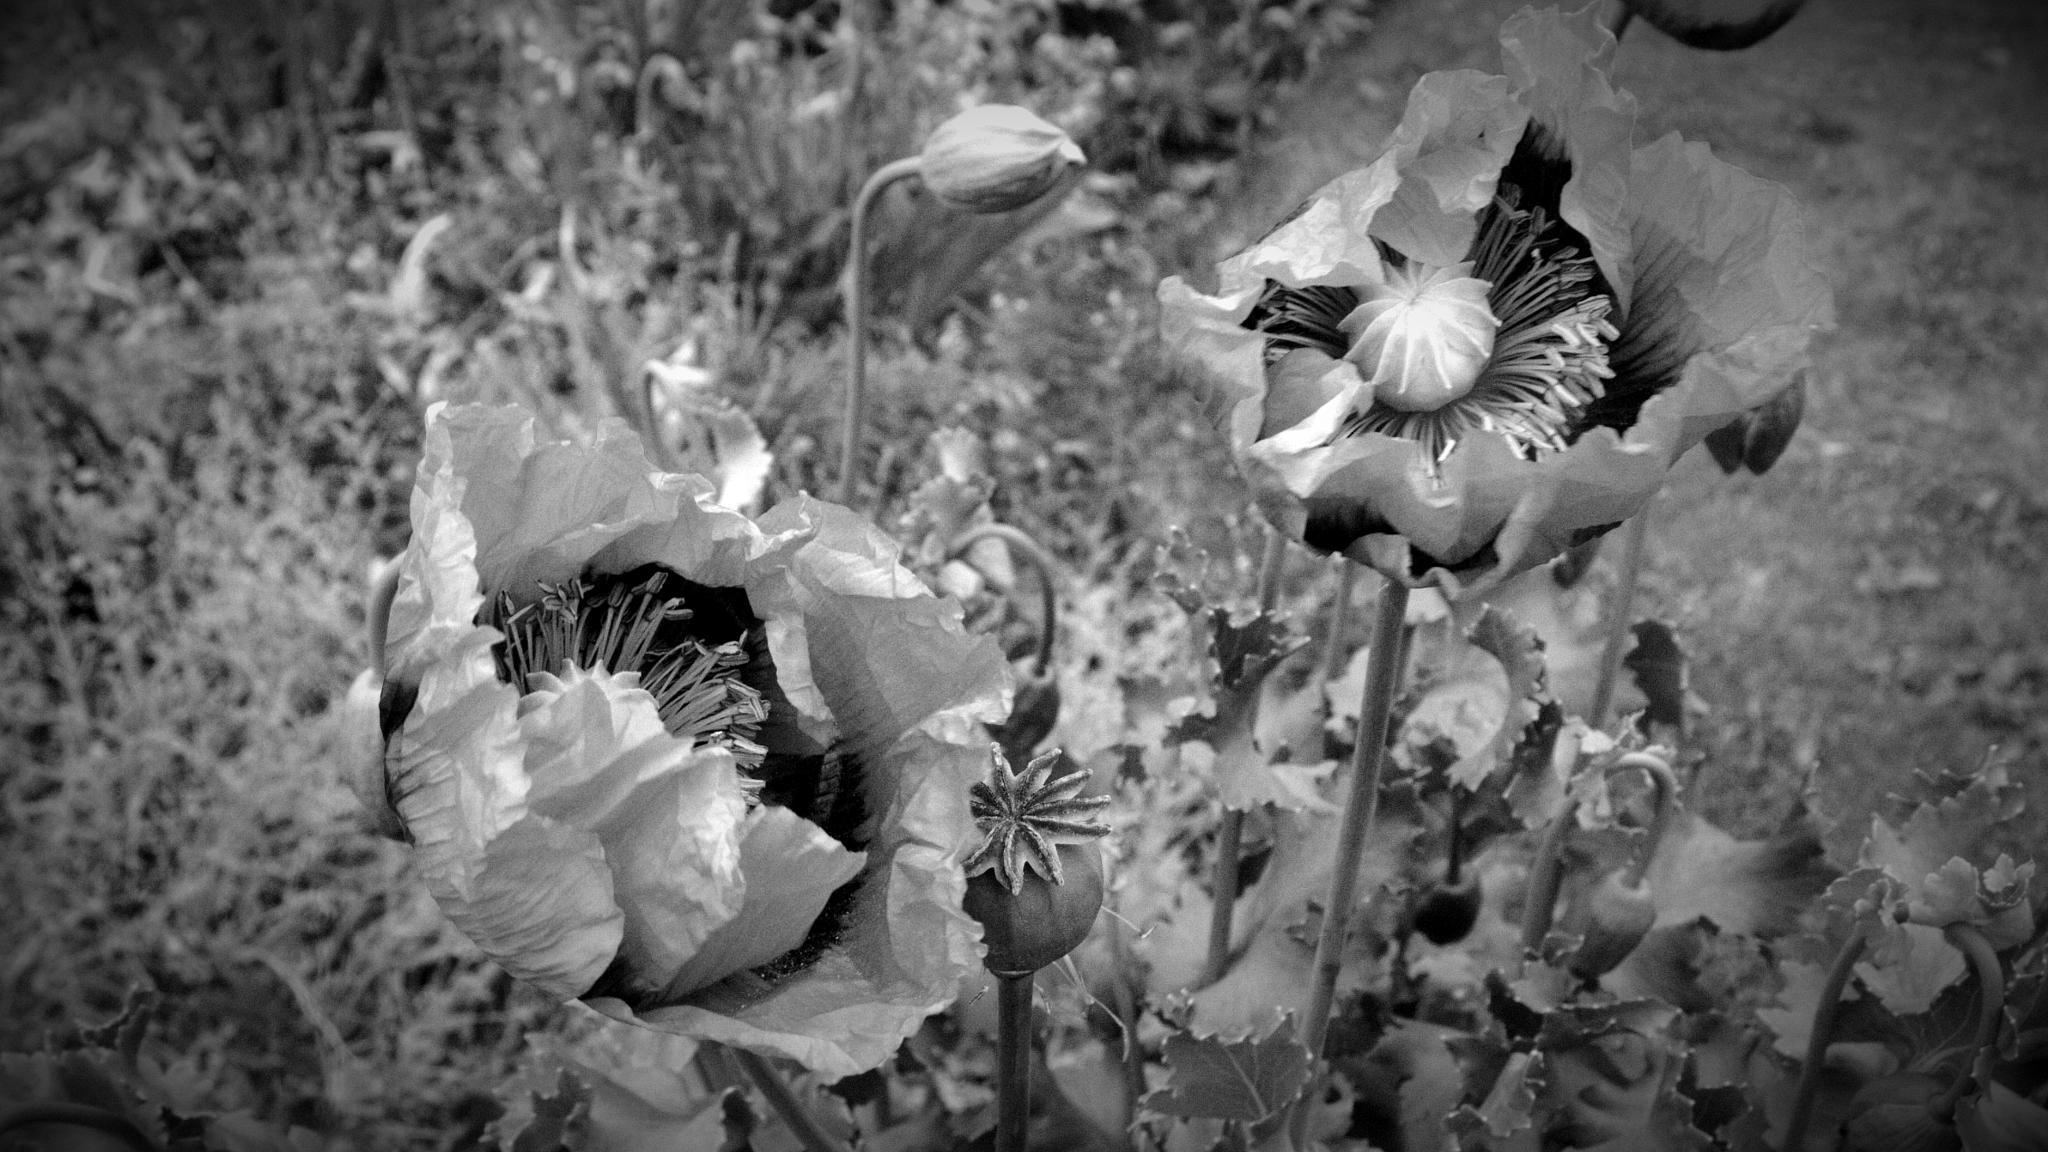 Just A Photograph 234 by Dorian Stretton